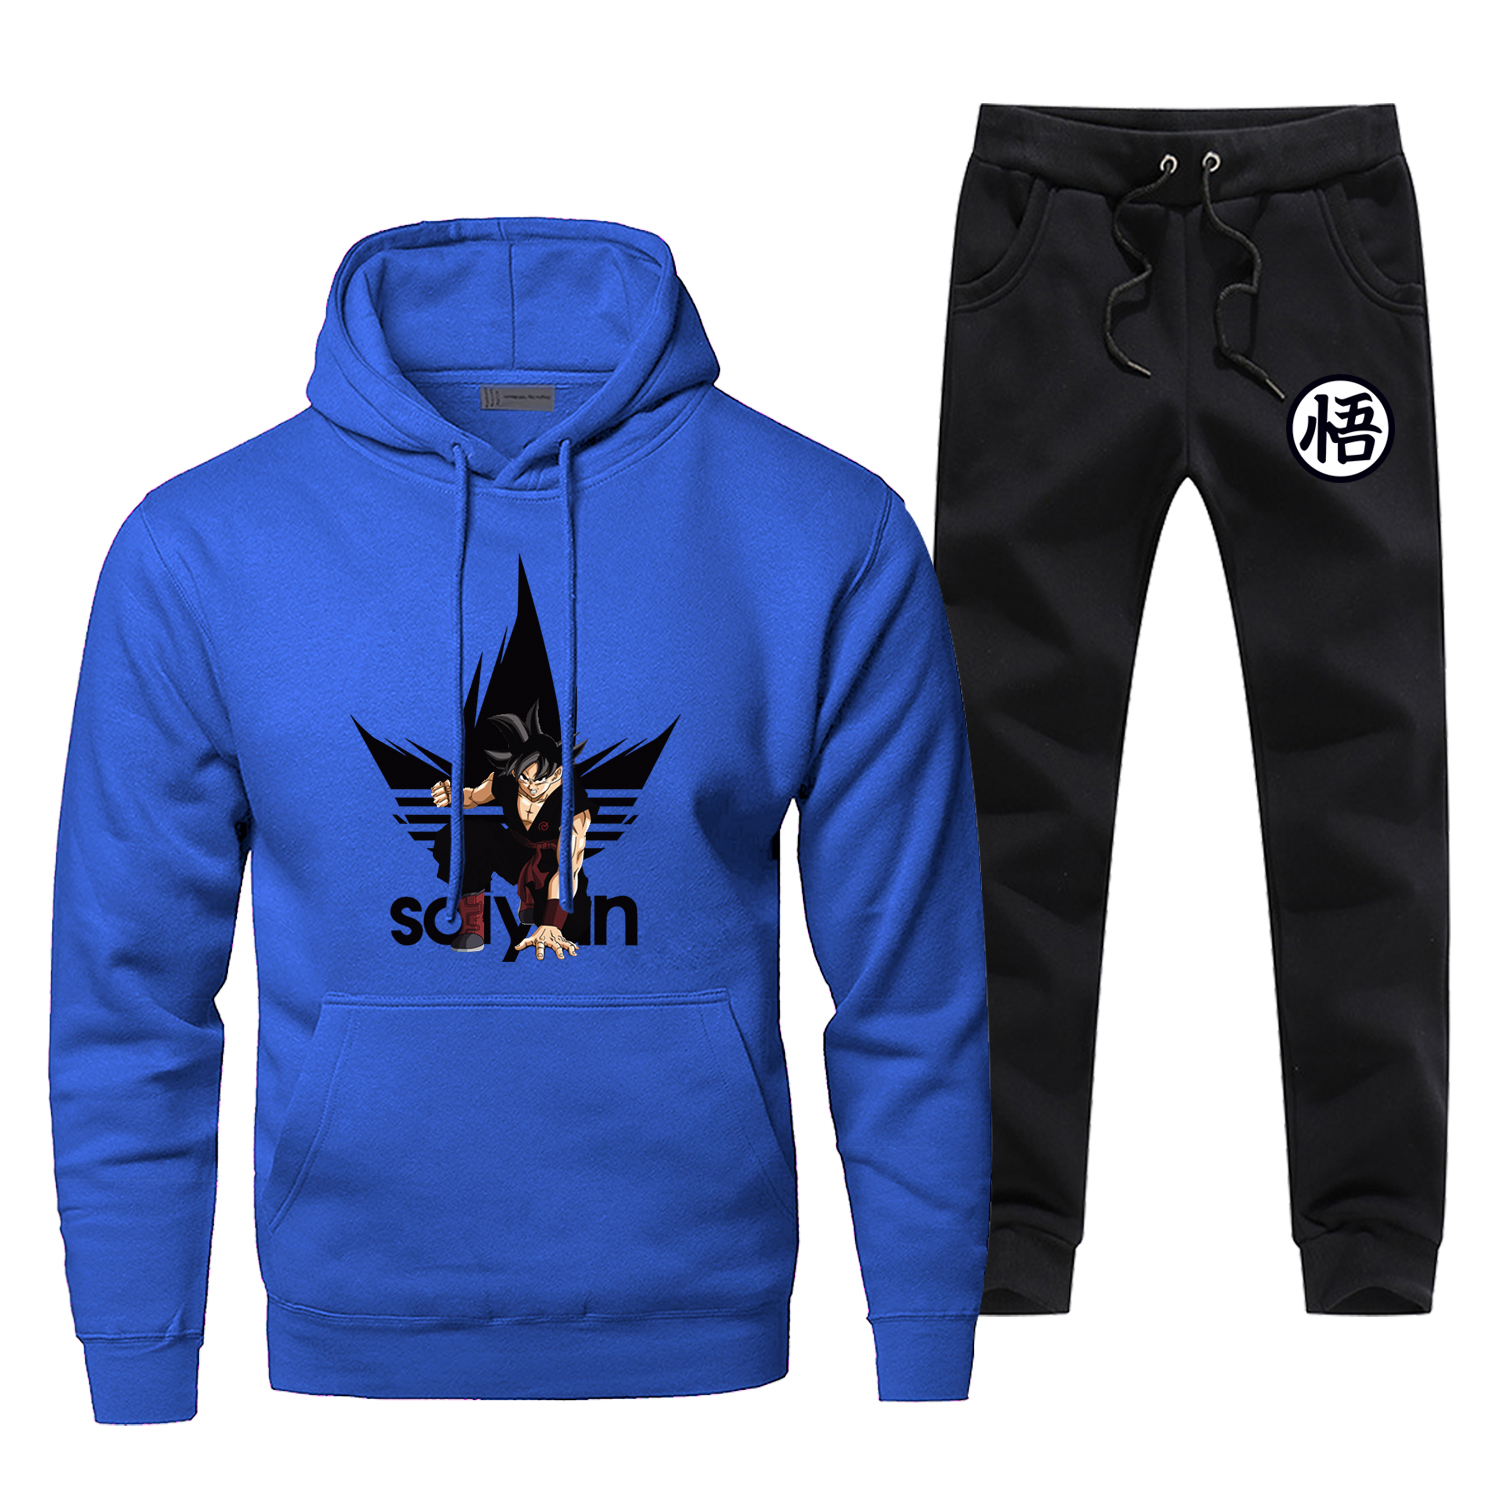 Dragon Ball Z Brand Man Tracksuit Fashion Super Saiyan Men's Sets Casual Japan Anime Men's Jogging Harajuku Bodywarmer Male Set